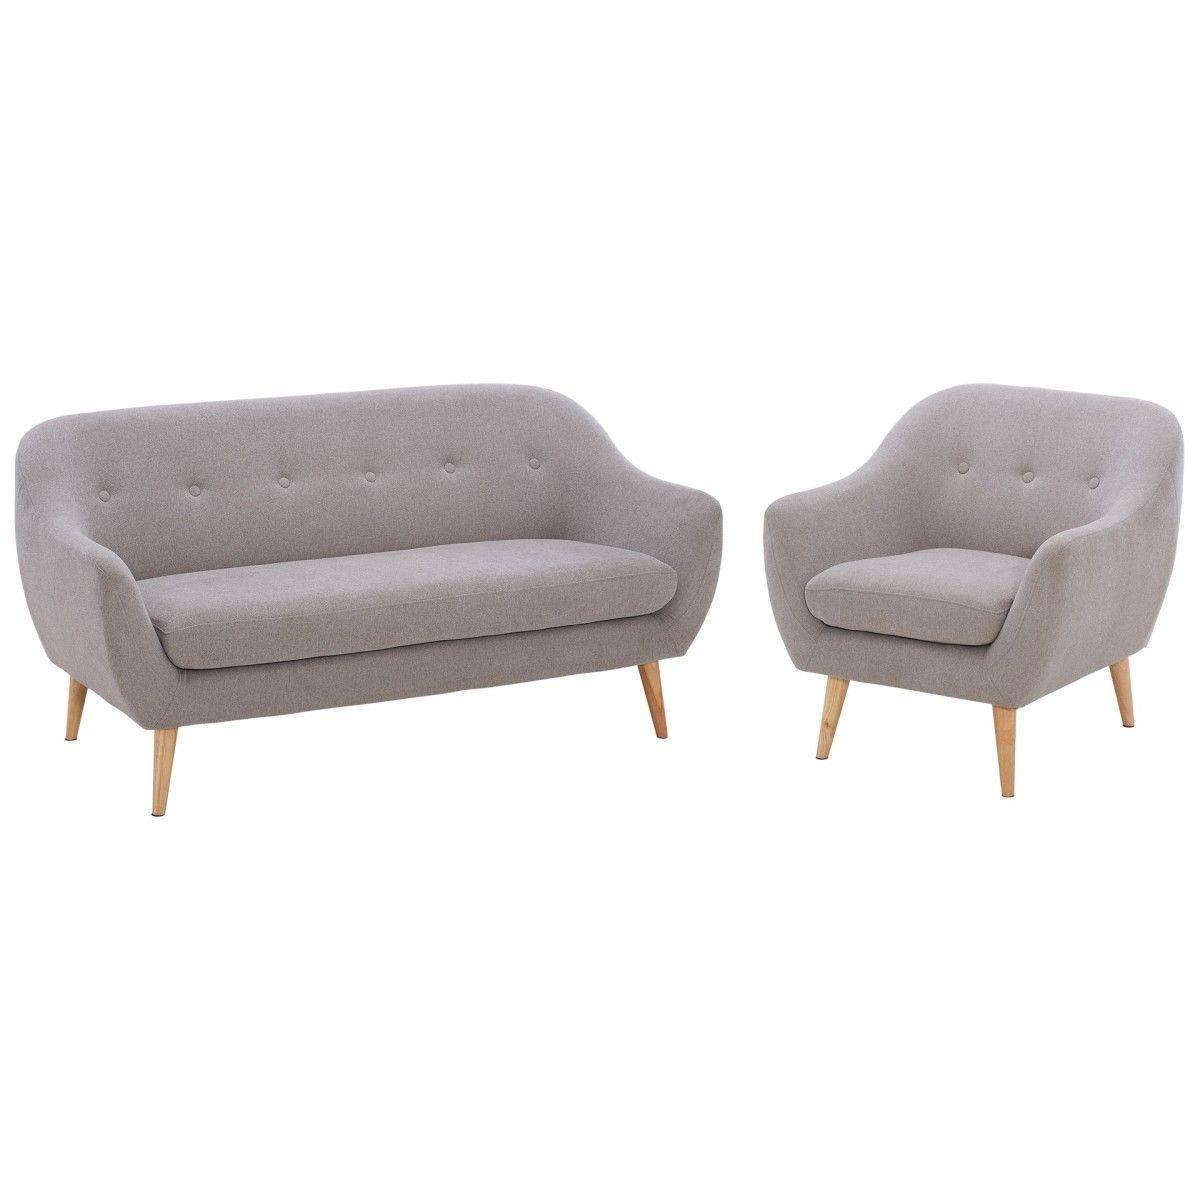 Sofa Set Egedal 1 Sofa 1 Sessel In 2019 New Apartment